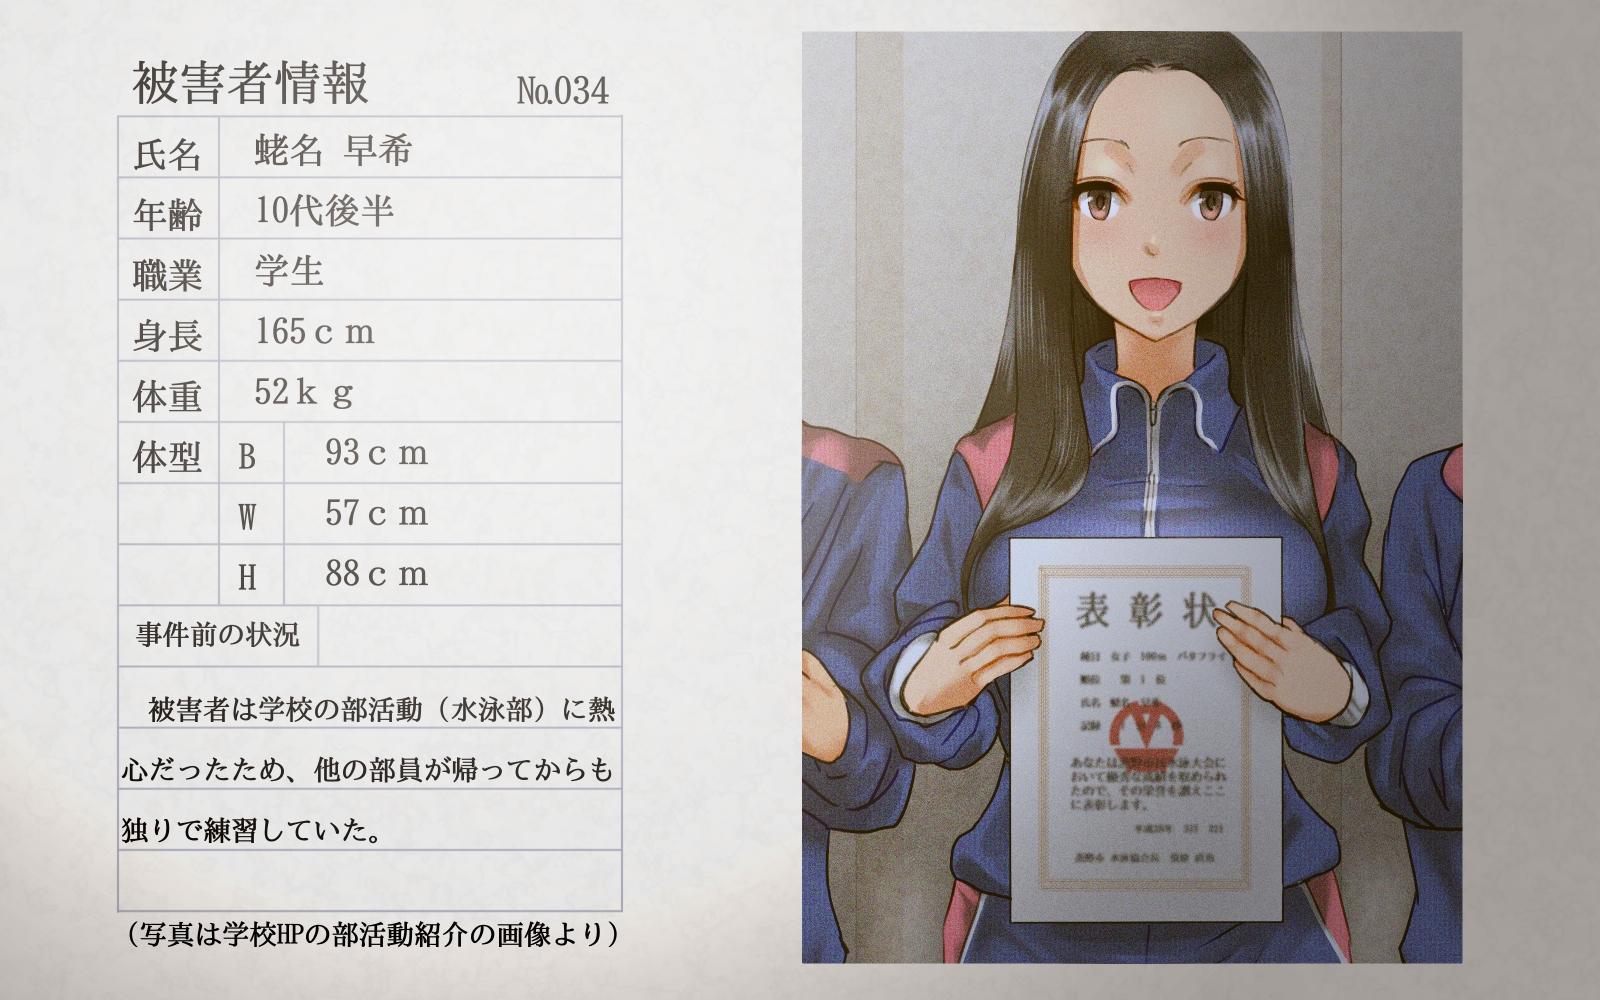 Chuukan Houkokusho 9